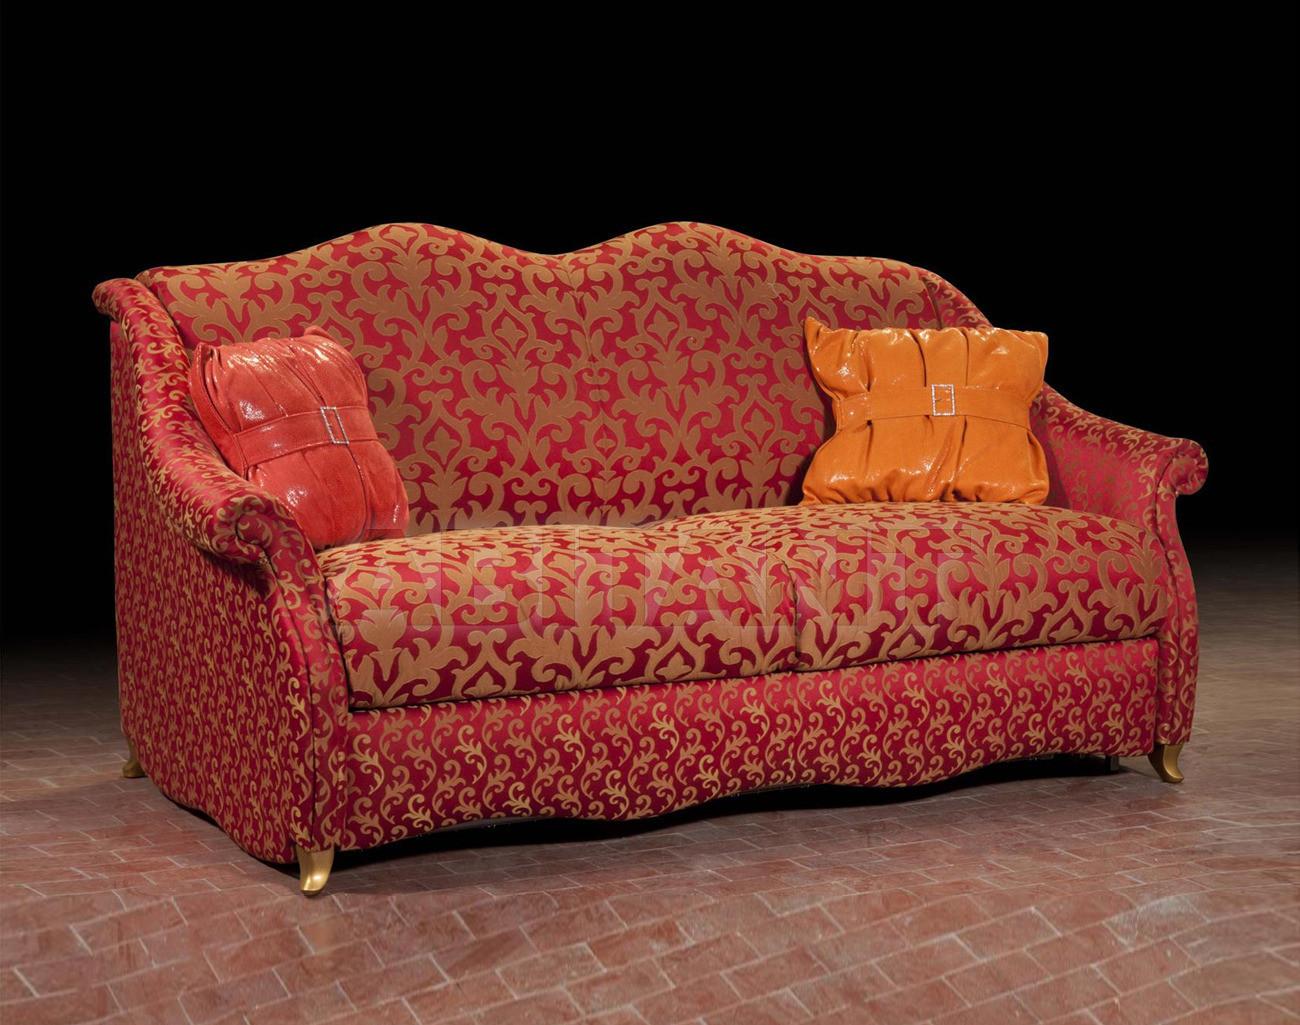 Купить Диван Saturno Mantellassi  Donna Mantellassi Saturno midi sofa